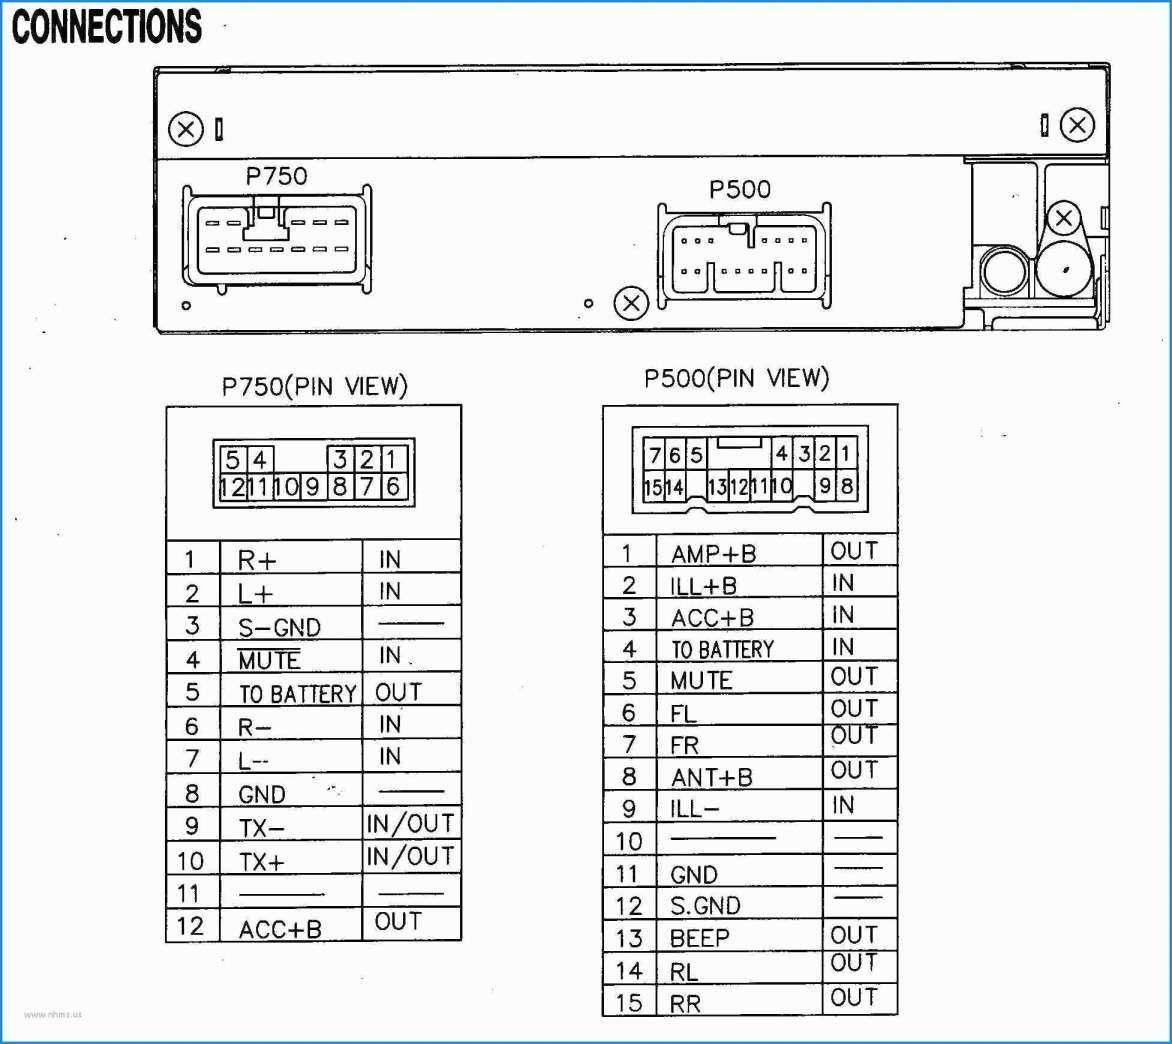 10+ sanyo car radio wiring diagram - car diagram in 2020 | car stereo  systems, car stereo, sound system car  pinterest